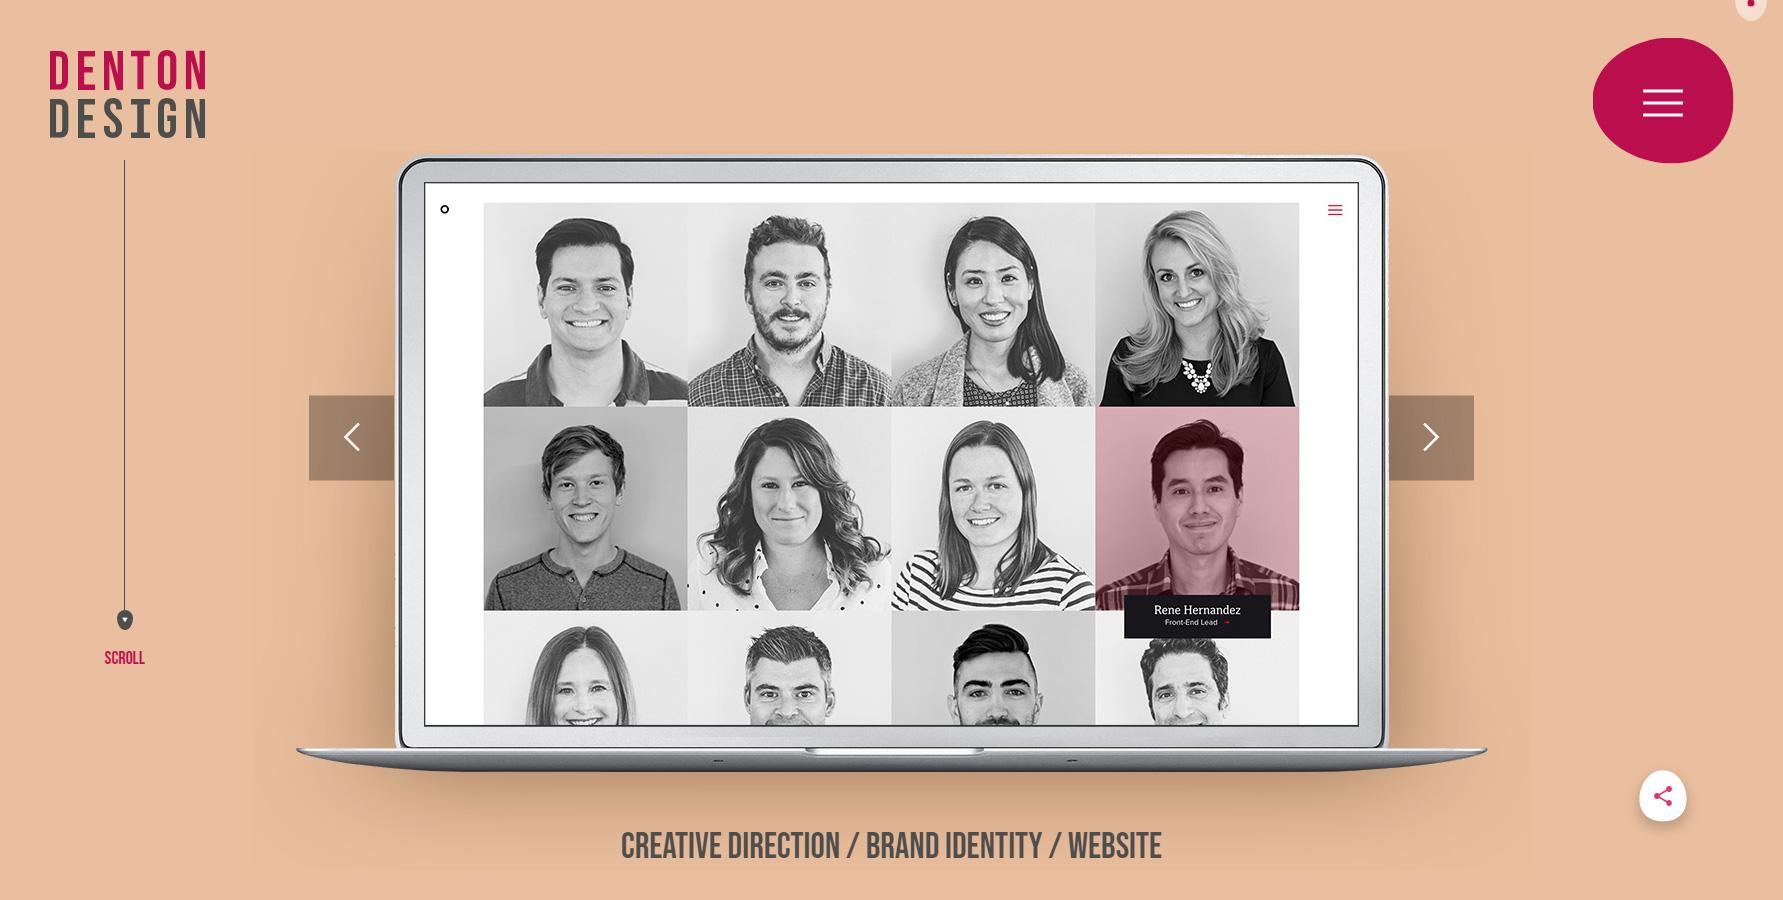 Denton Design - Website of the Day